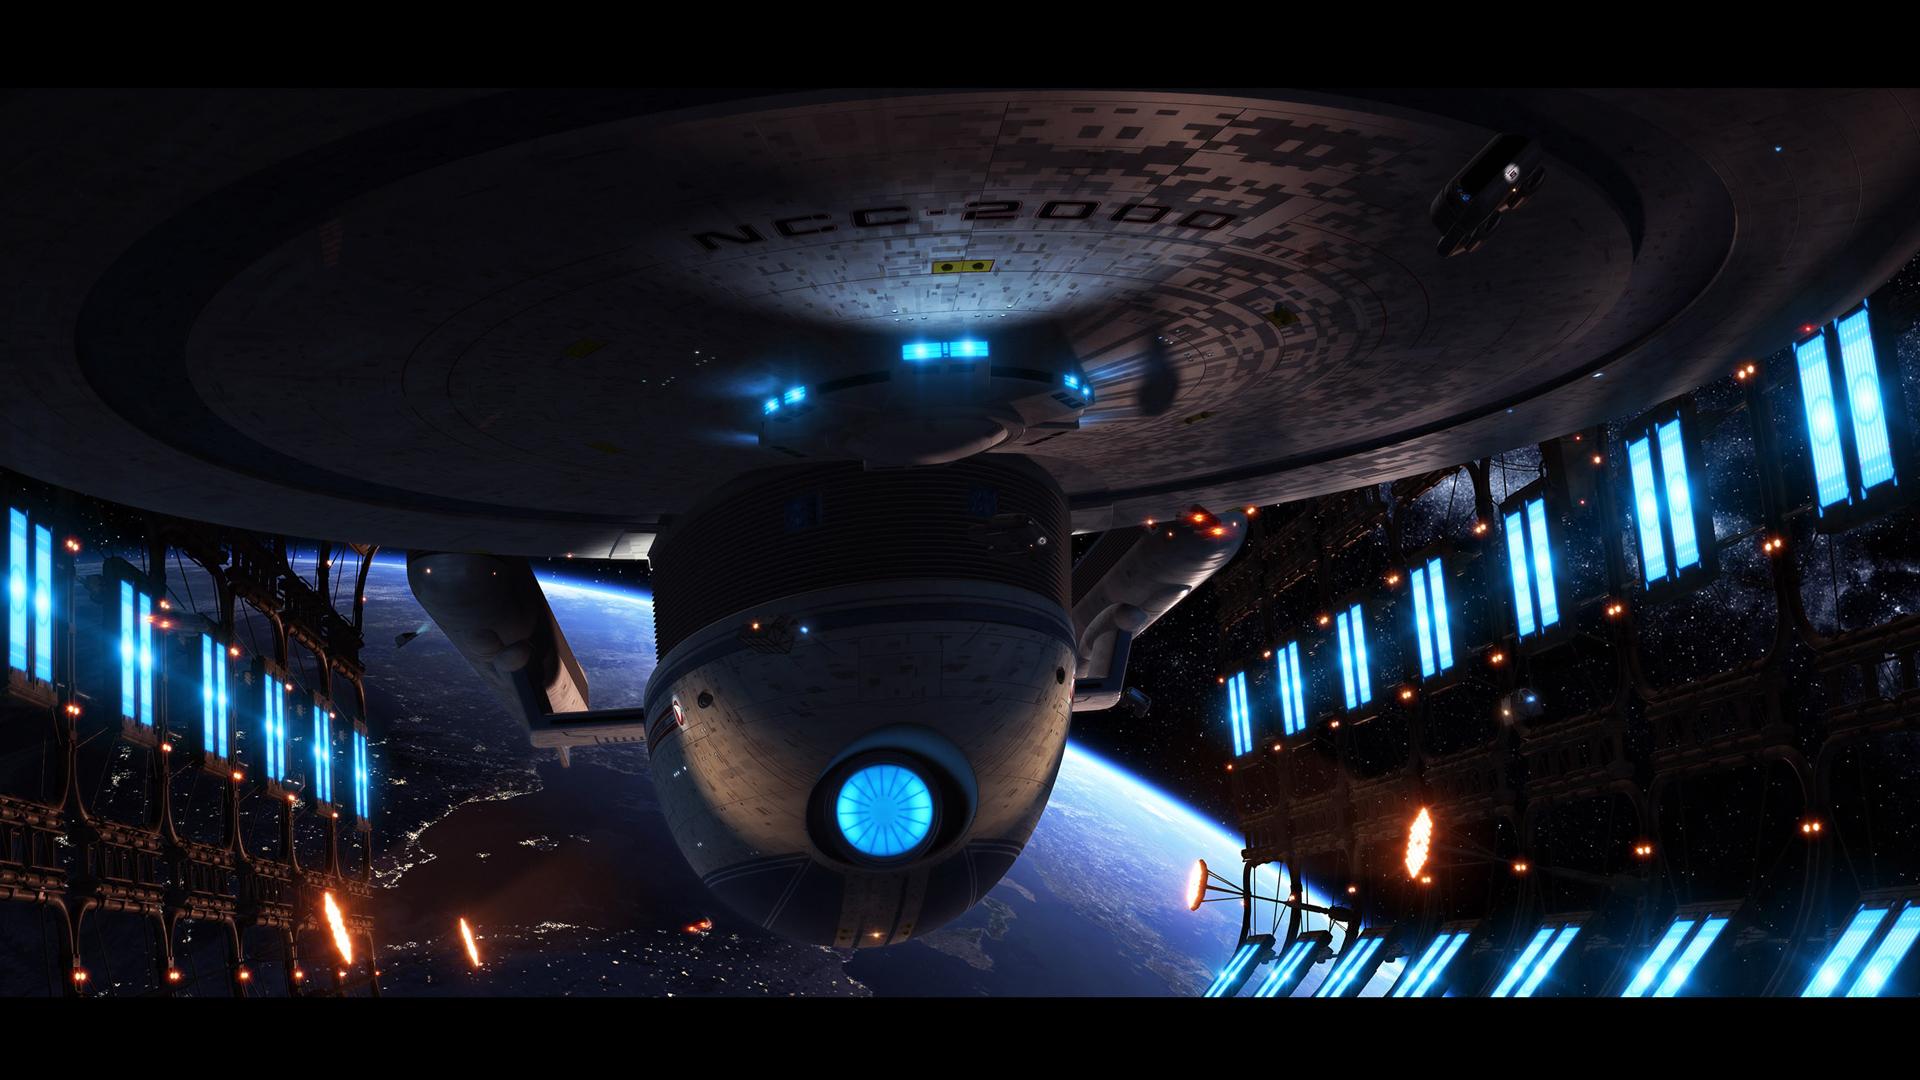 Ships Of Star Trek Hd Wallpapers 1920x1080